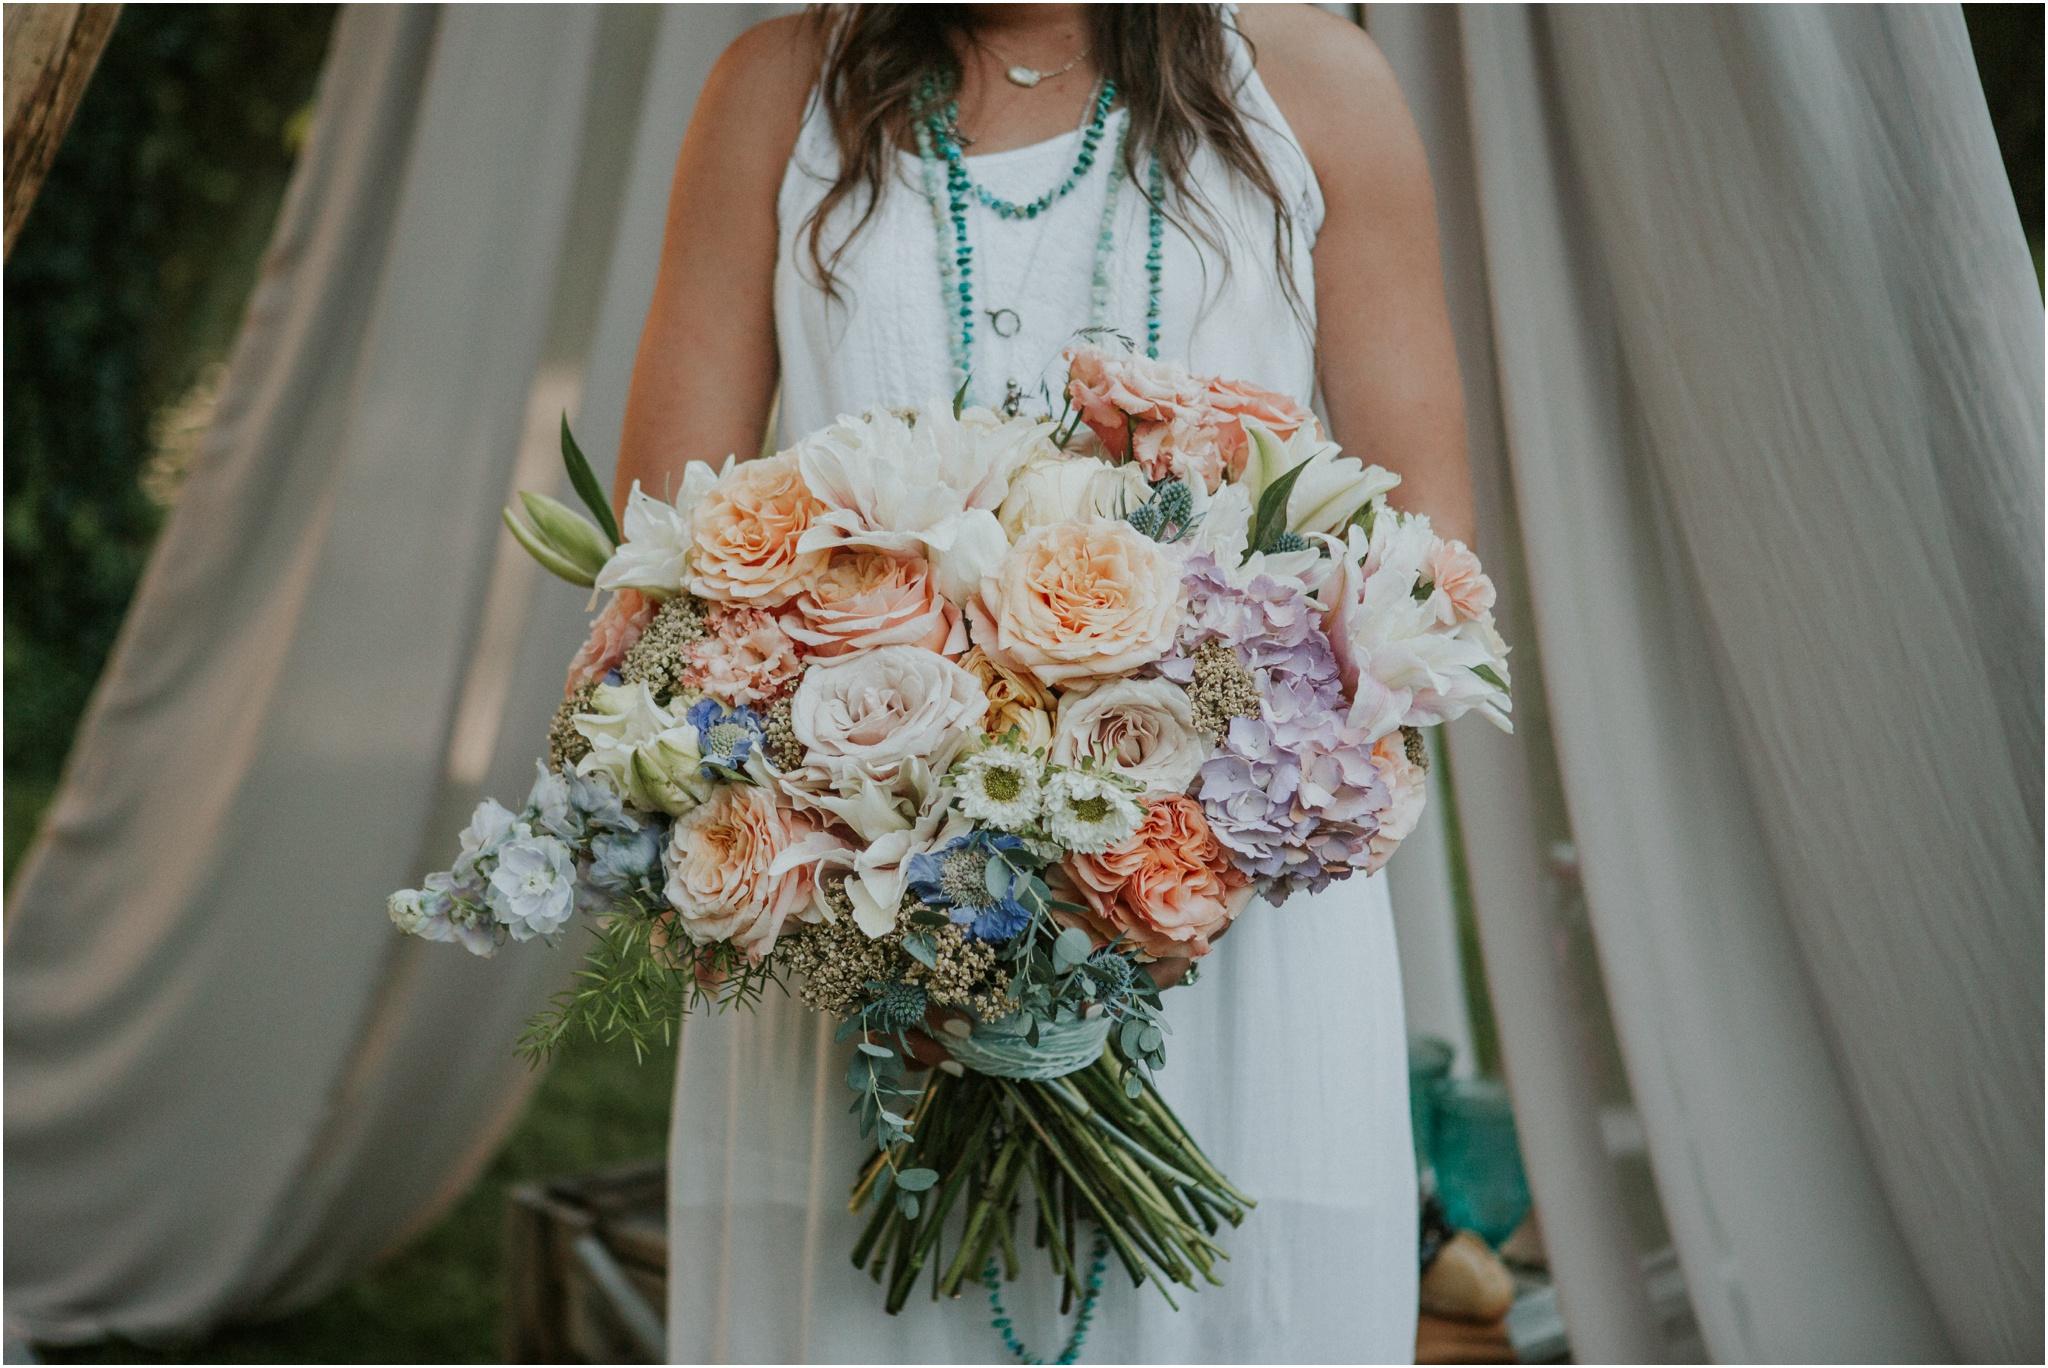 bohemian-canoe-pastel-blush-elopement-intimate-wedding-homestead-holston_0006.jpg